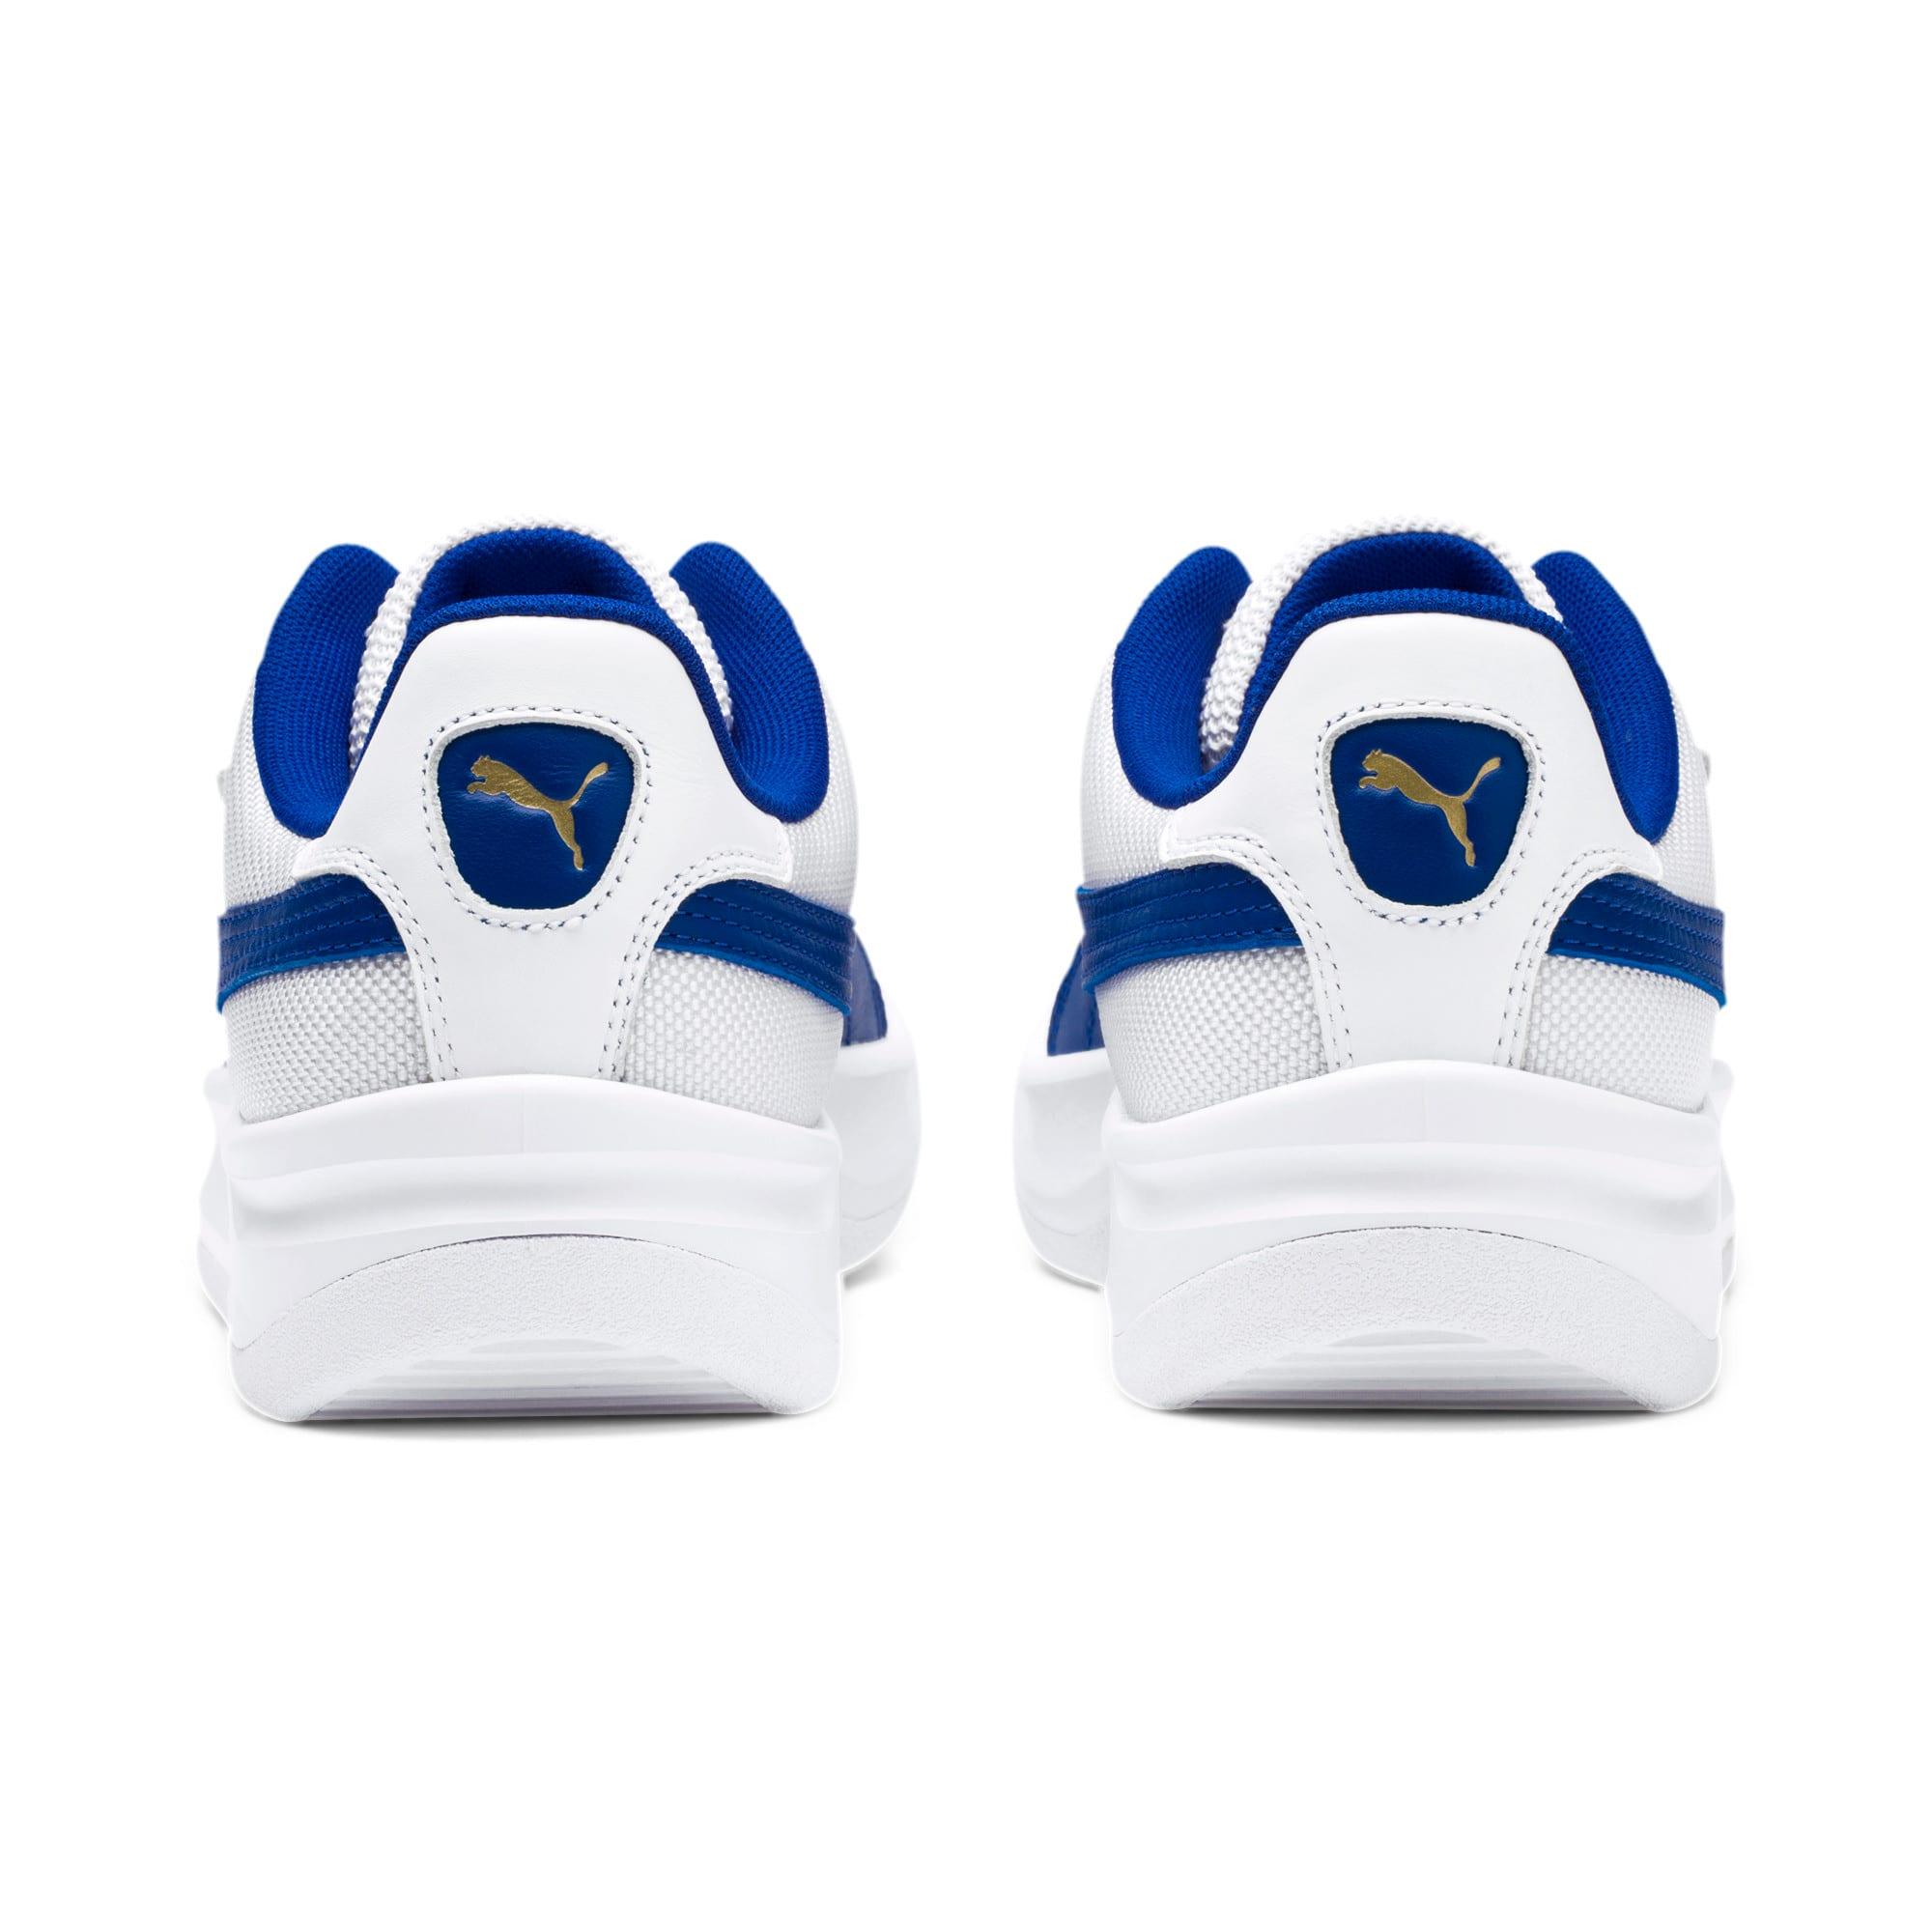 Thumbnail 4 of California Sneakers, Puma White-Surf D Web-P Wht, medium